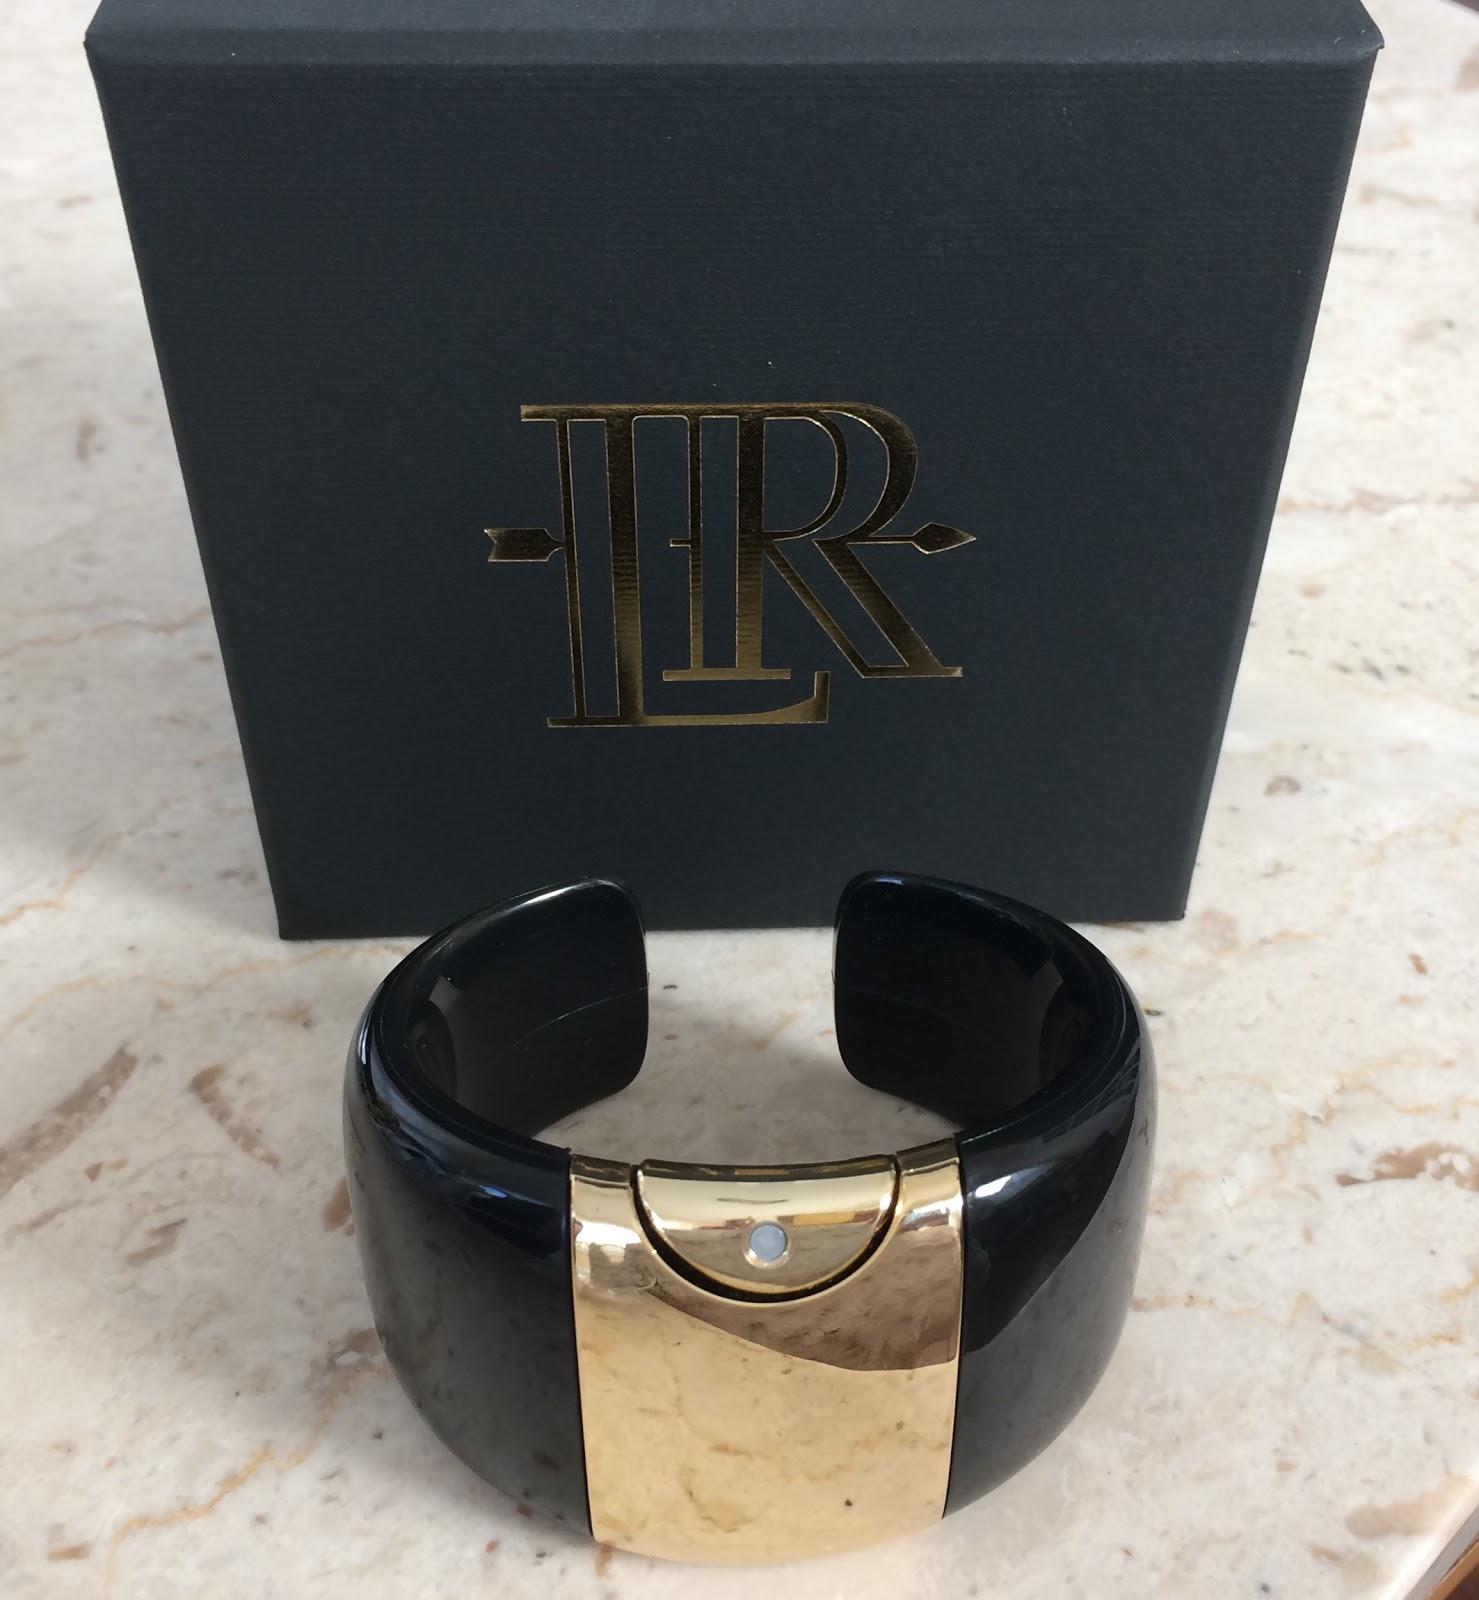 Blue apron qvc - Blue Skies For Me Please Qvc S Lisa Robertson S Jewelry Line Review Perfume Bracelet